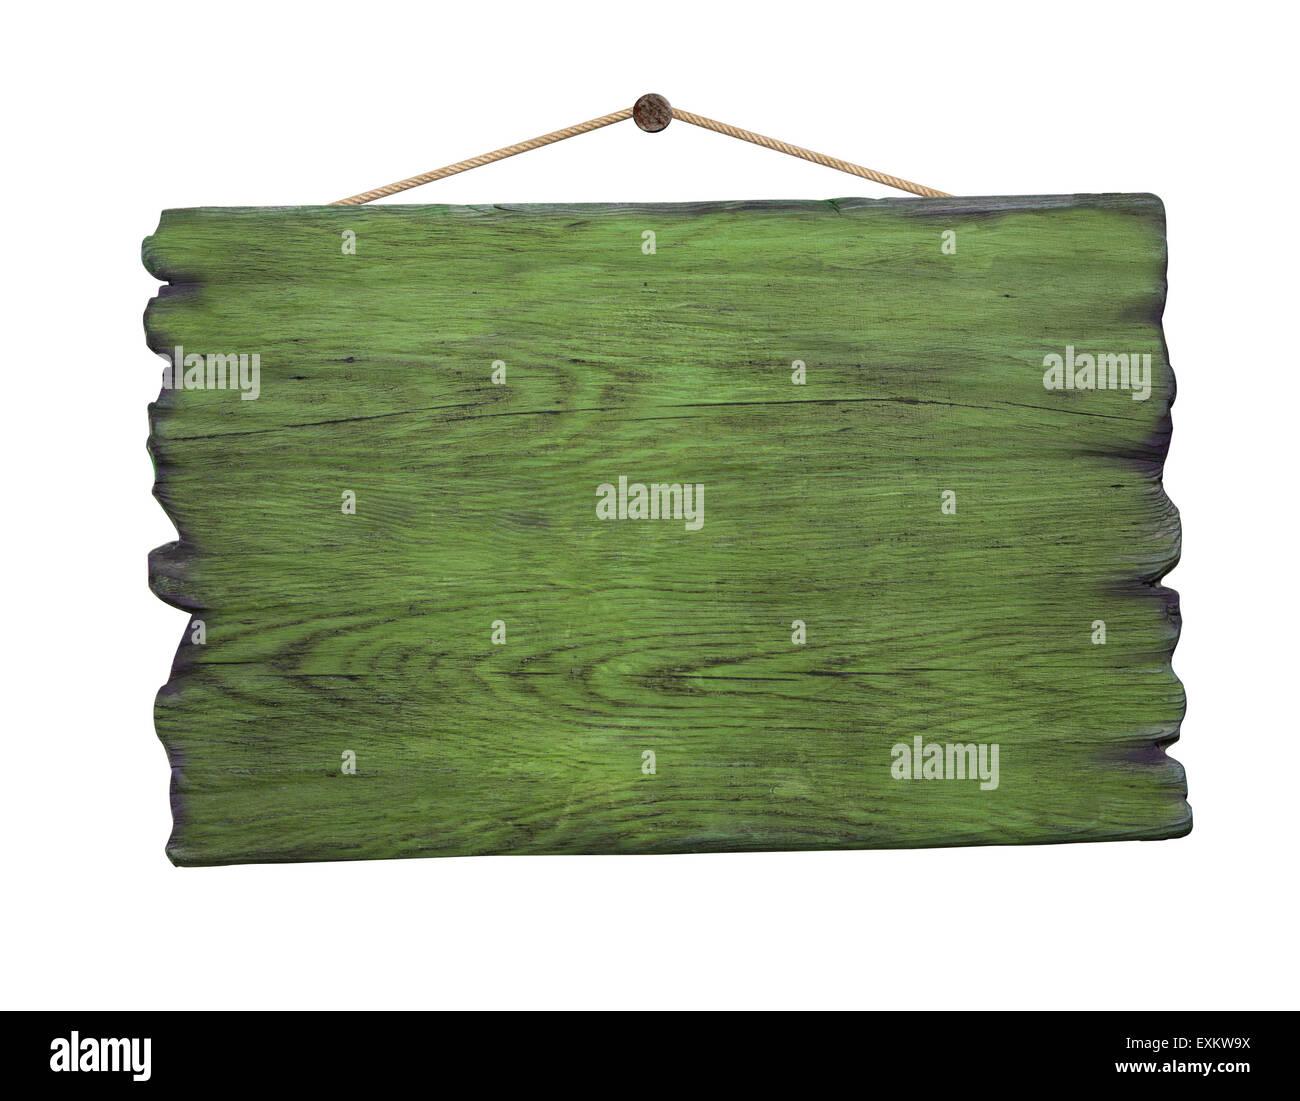 Grunge green wood signboard hanging on nail - Stock Image